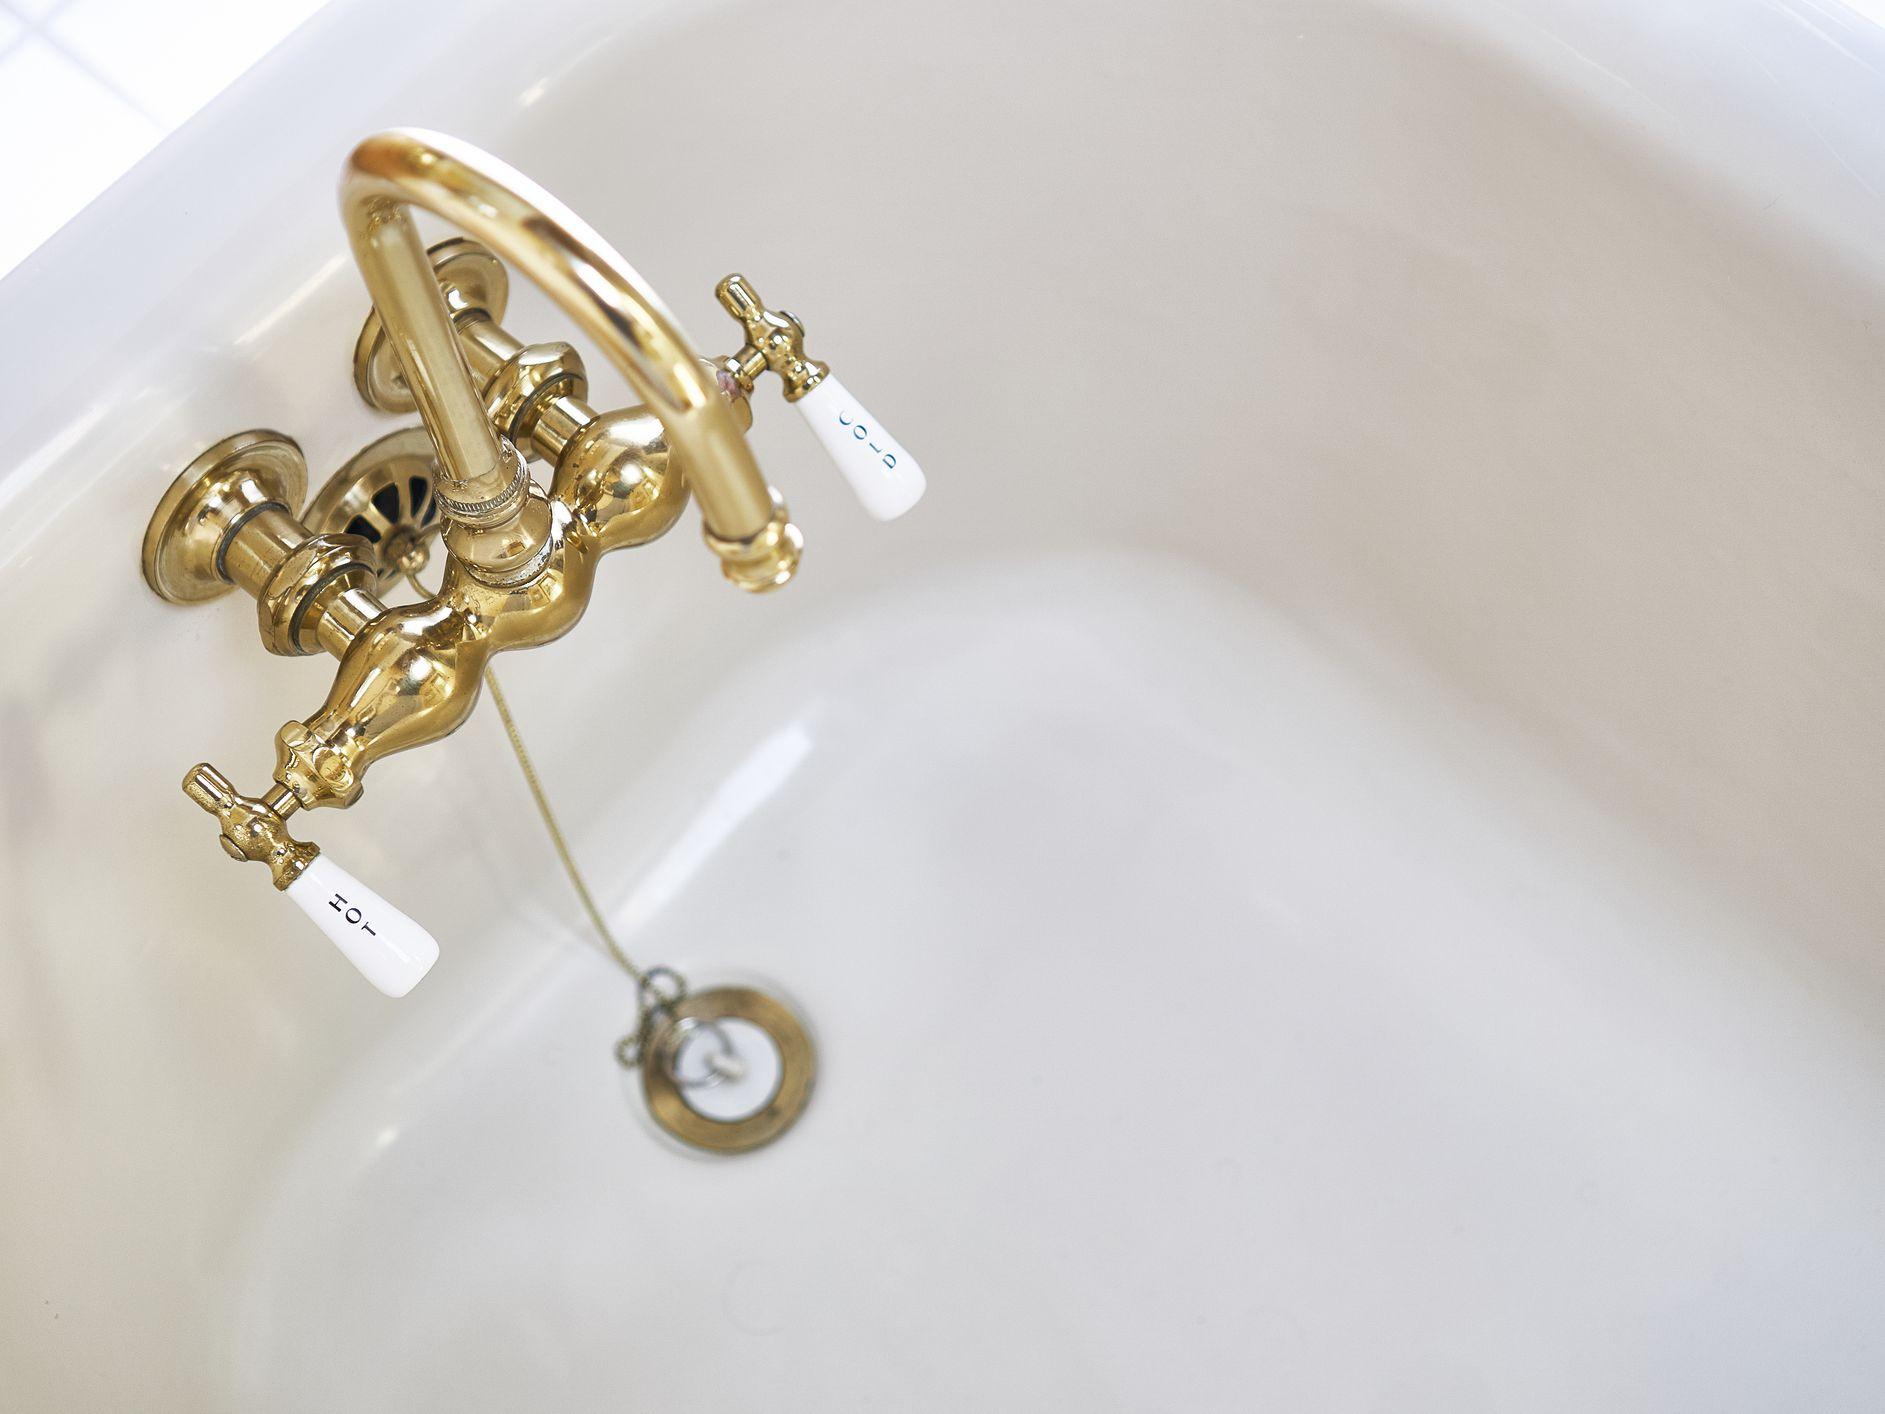 Unclog A Bathtub Drain Using A Snake